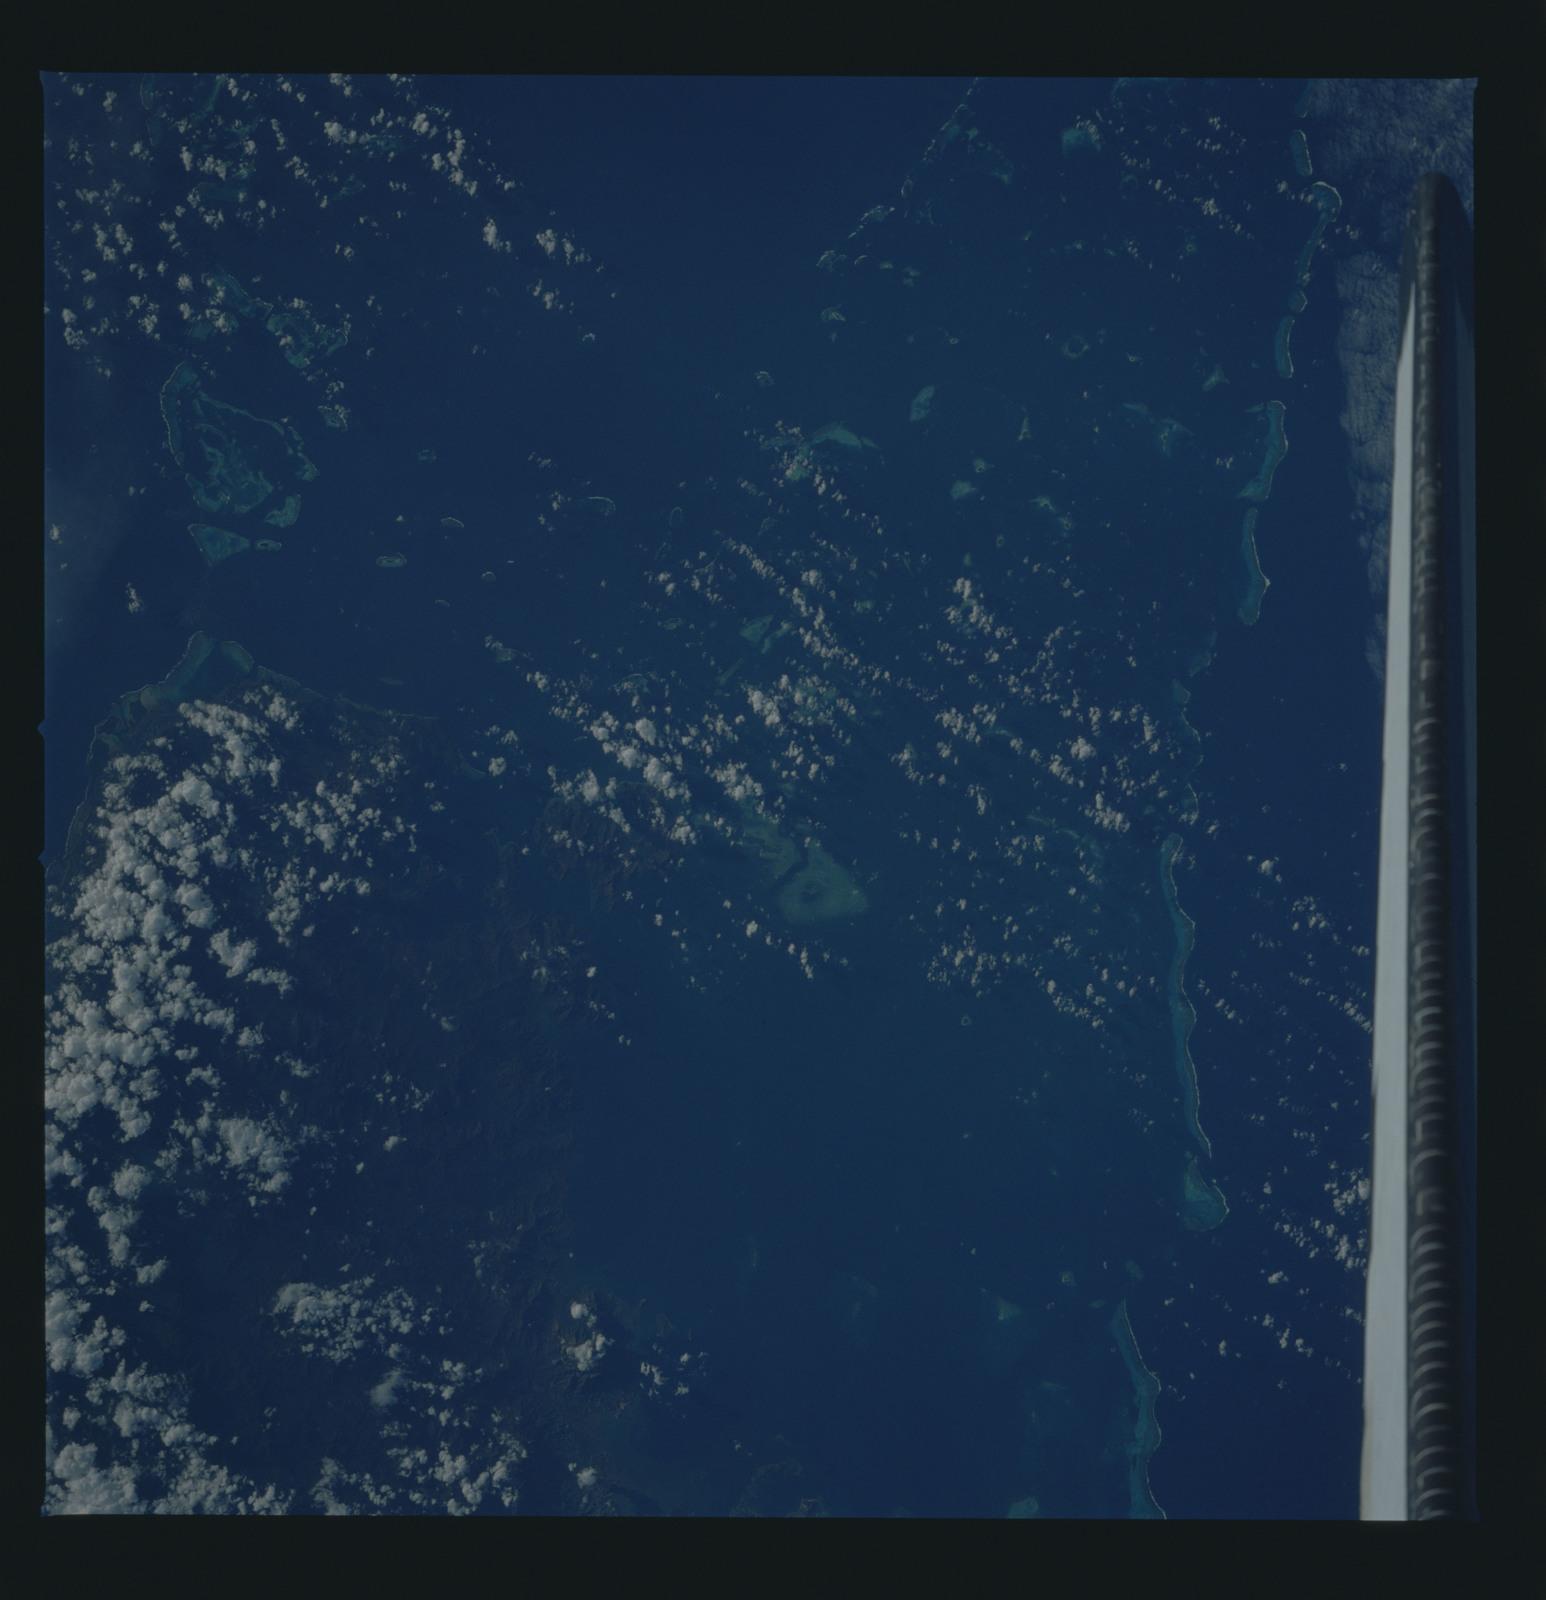 51B-41-018 - STS-51B - 51B earth observation